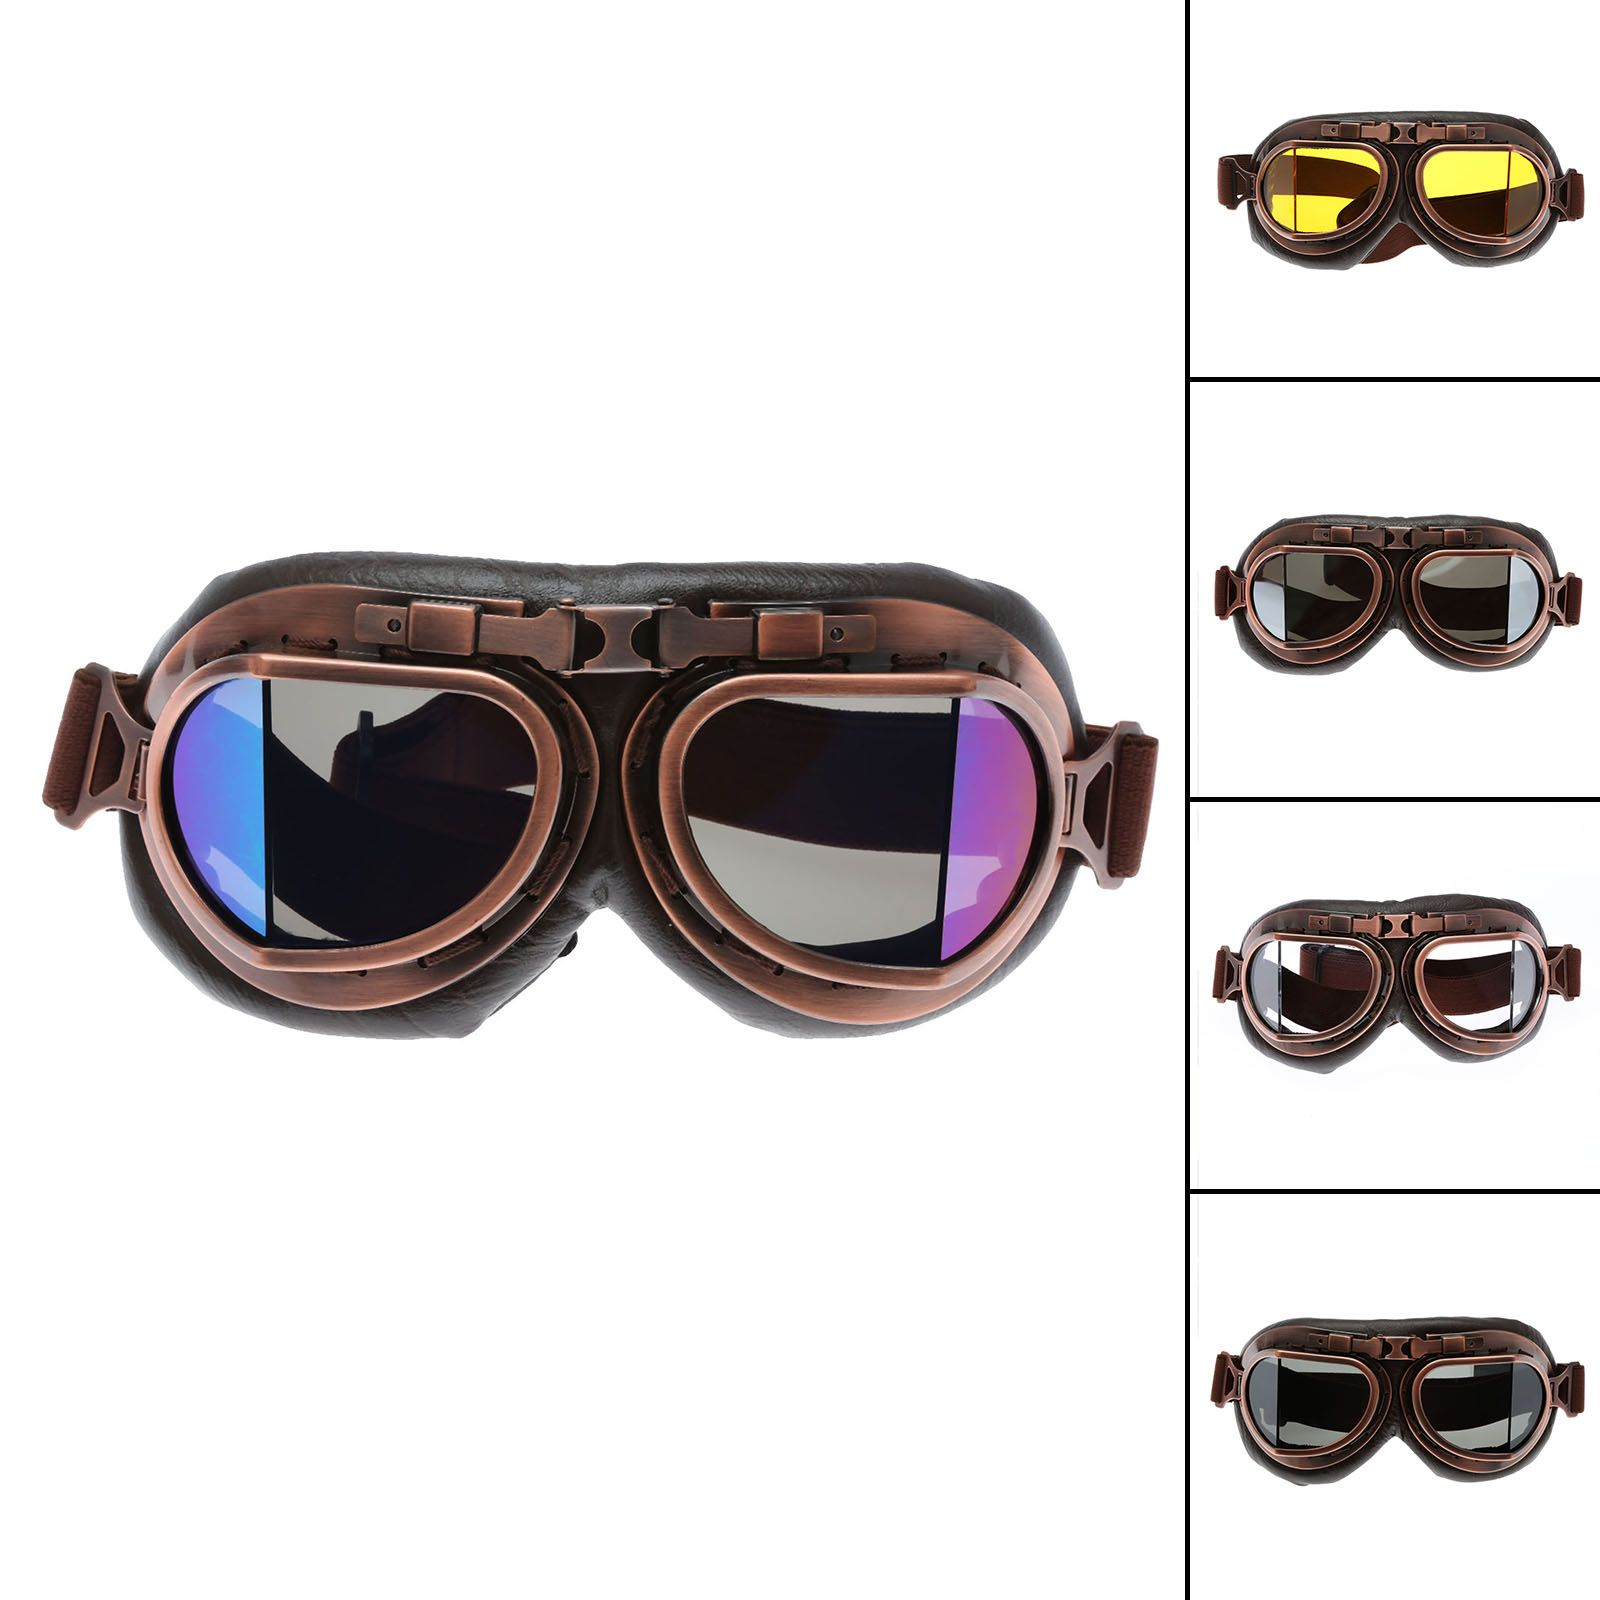 Motorcycle Goggles Glasses Vintage Motocross Classic Goggles Retro Aviator Pilot <font><b>Cruiser</b></font> Steampunk ATV Bike UV Protection Copper